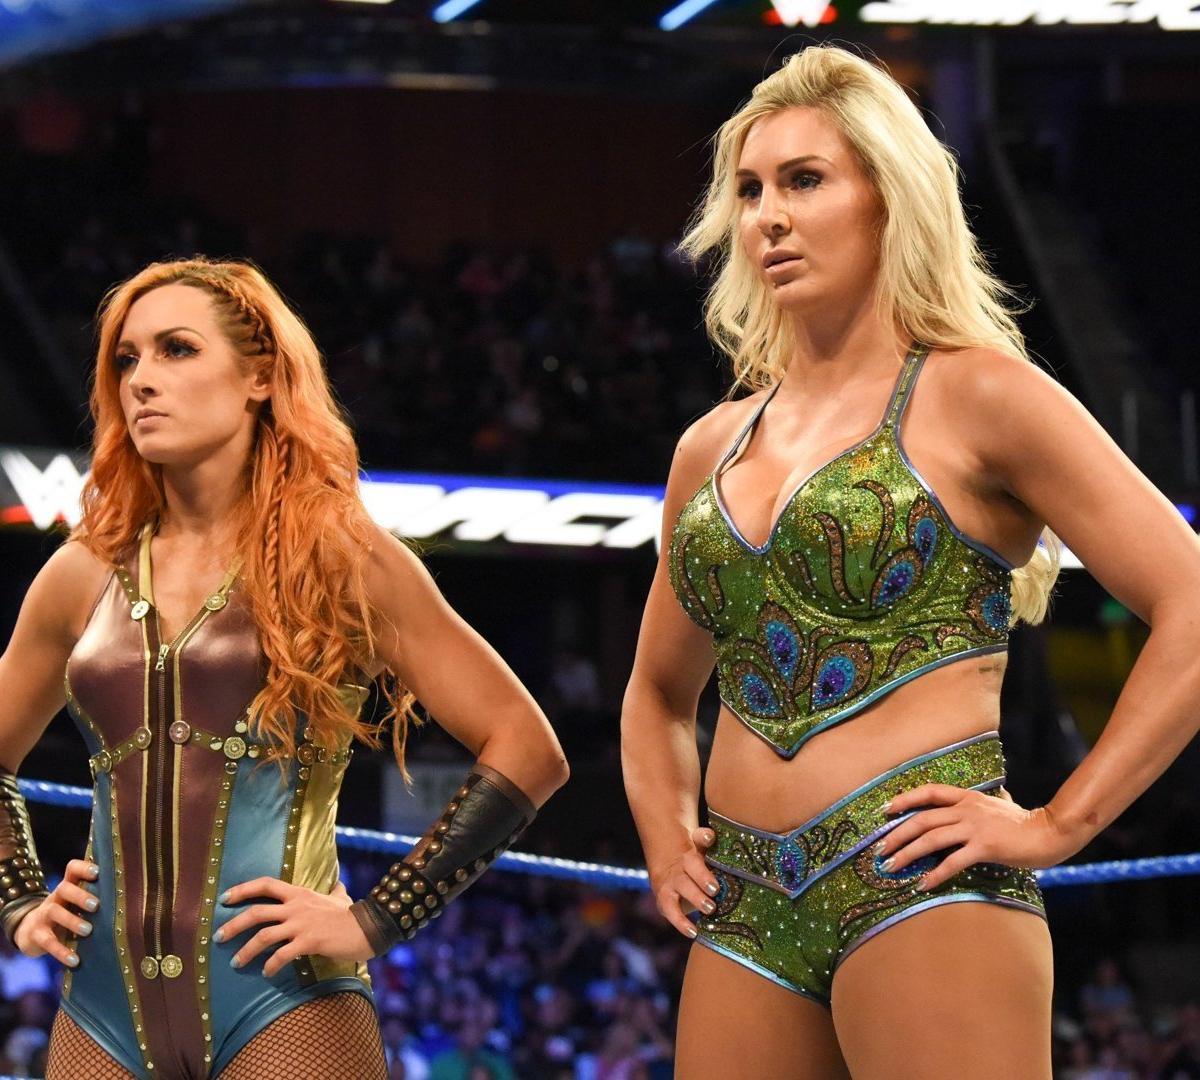 WWE News: WWE Womens Superstar suffered an injury during